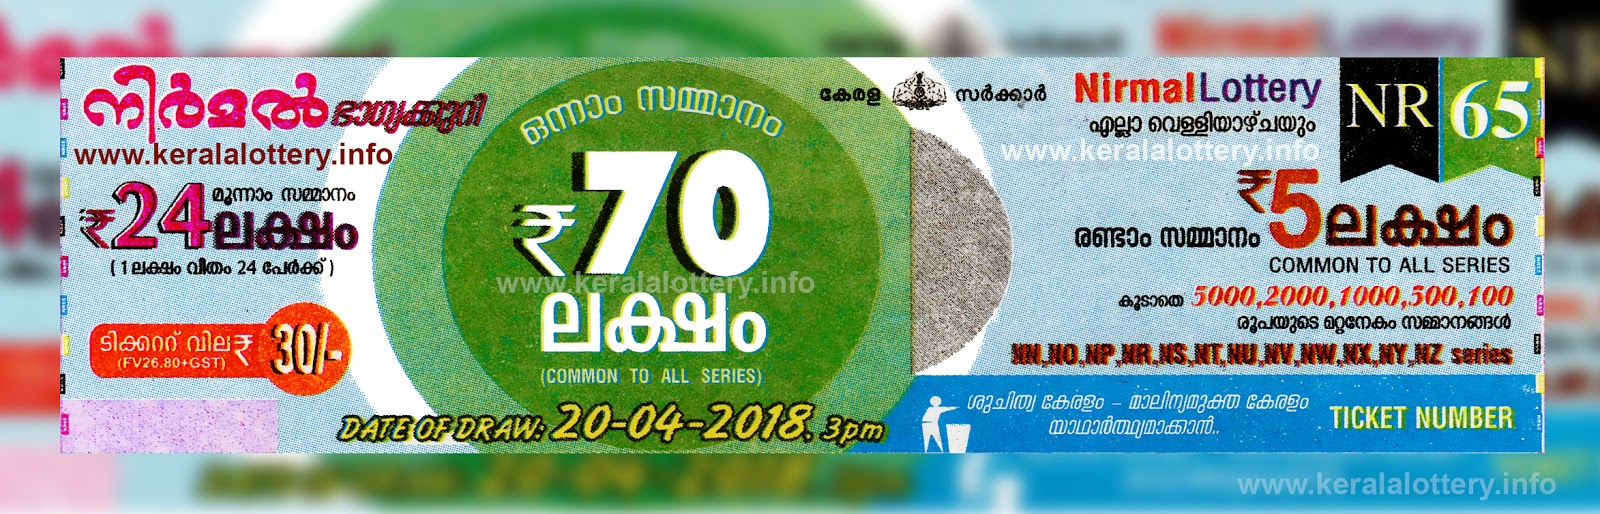 Kerala Lottery Results Today 20 03 2018 LIVE : Nirmal NR-65